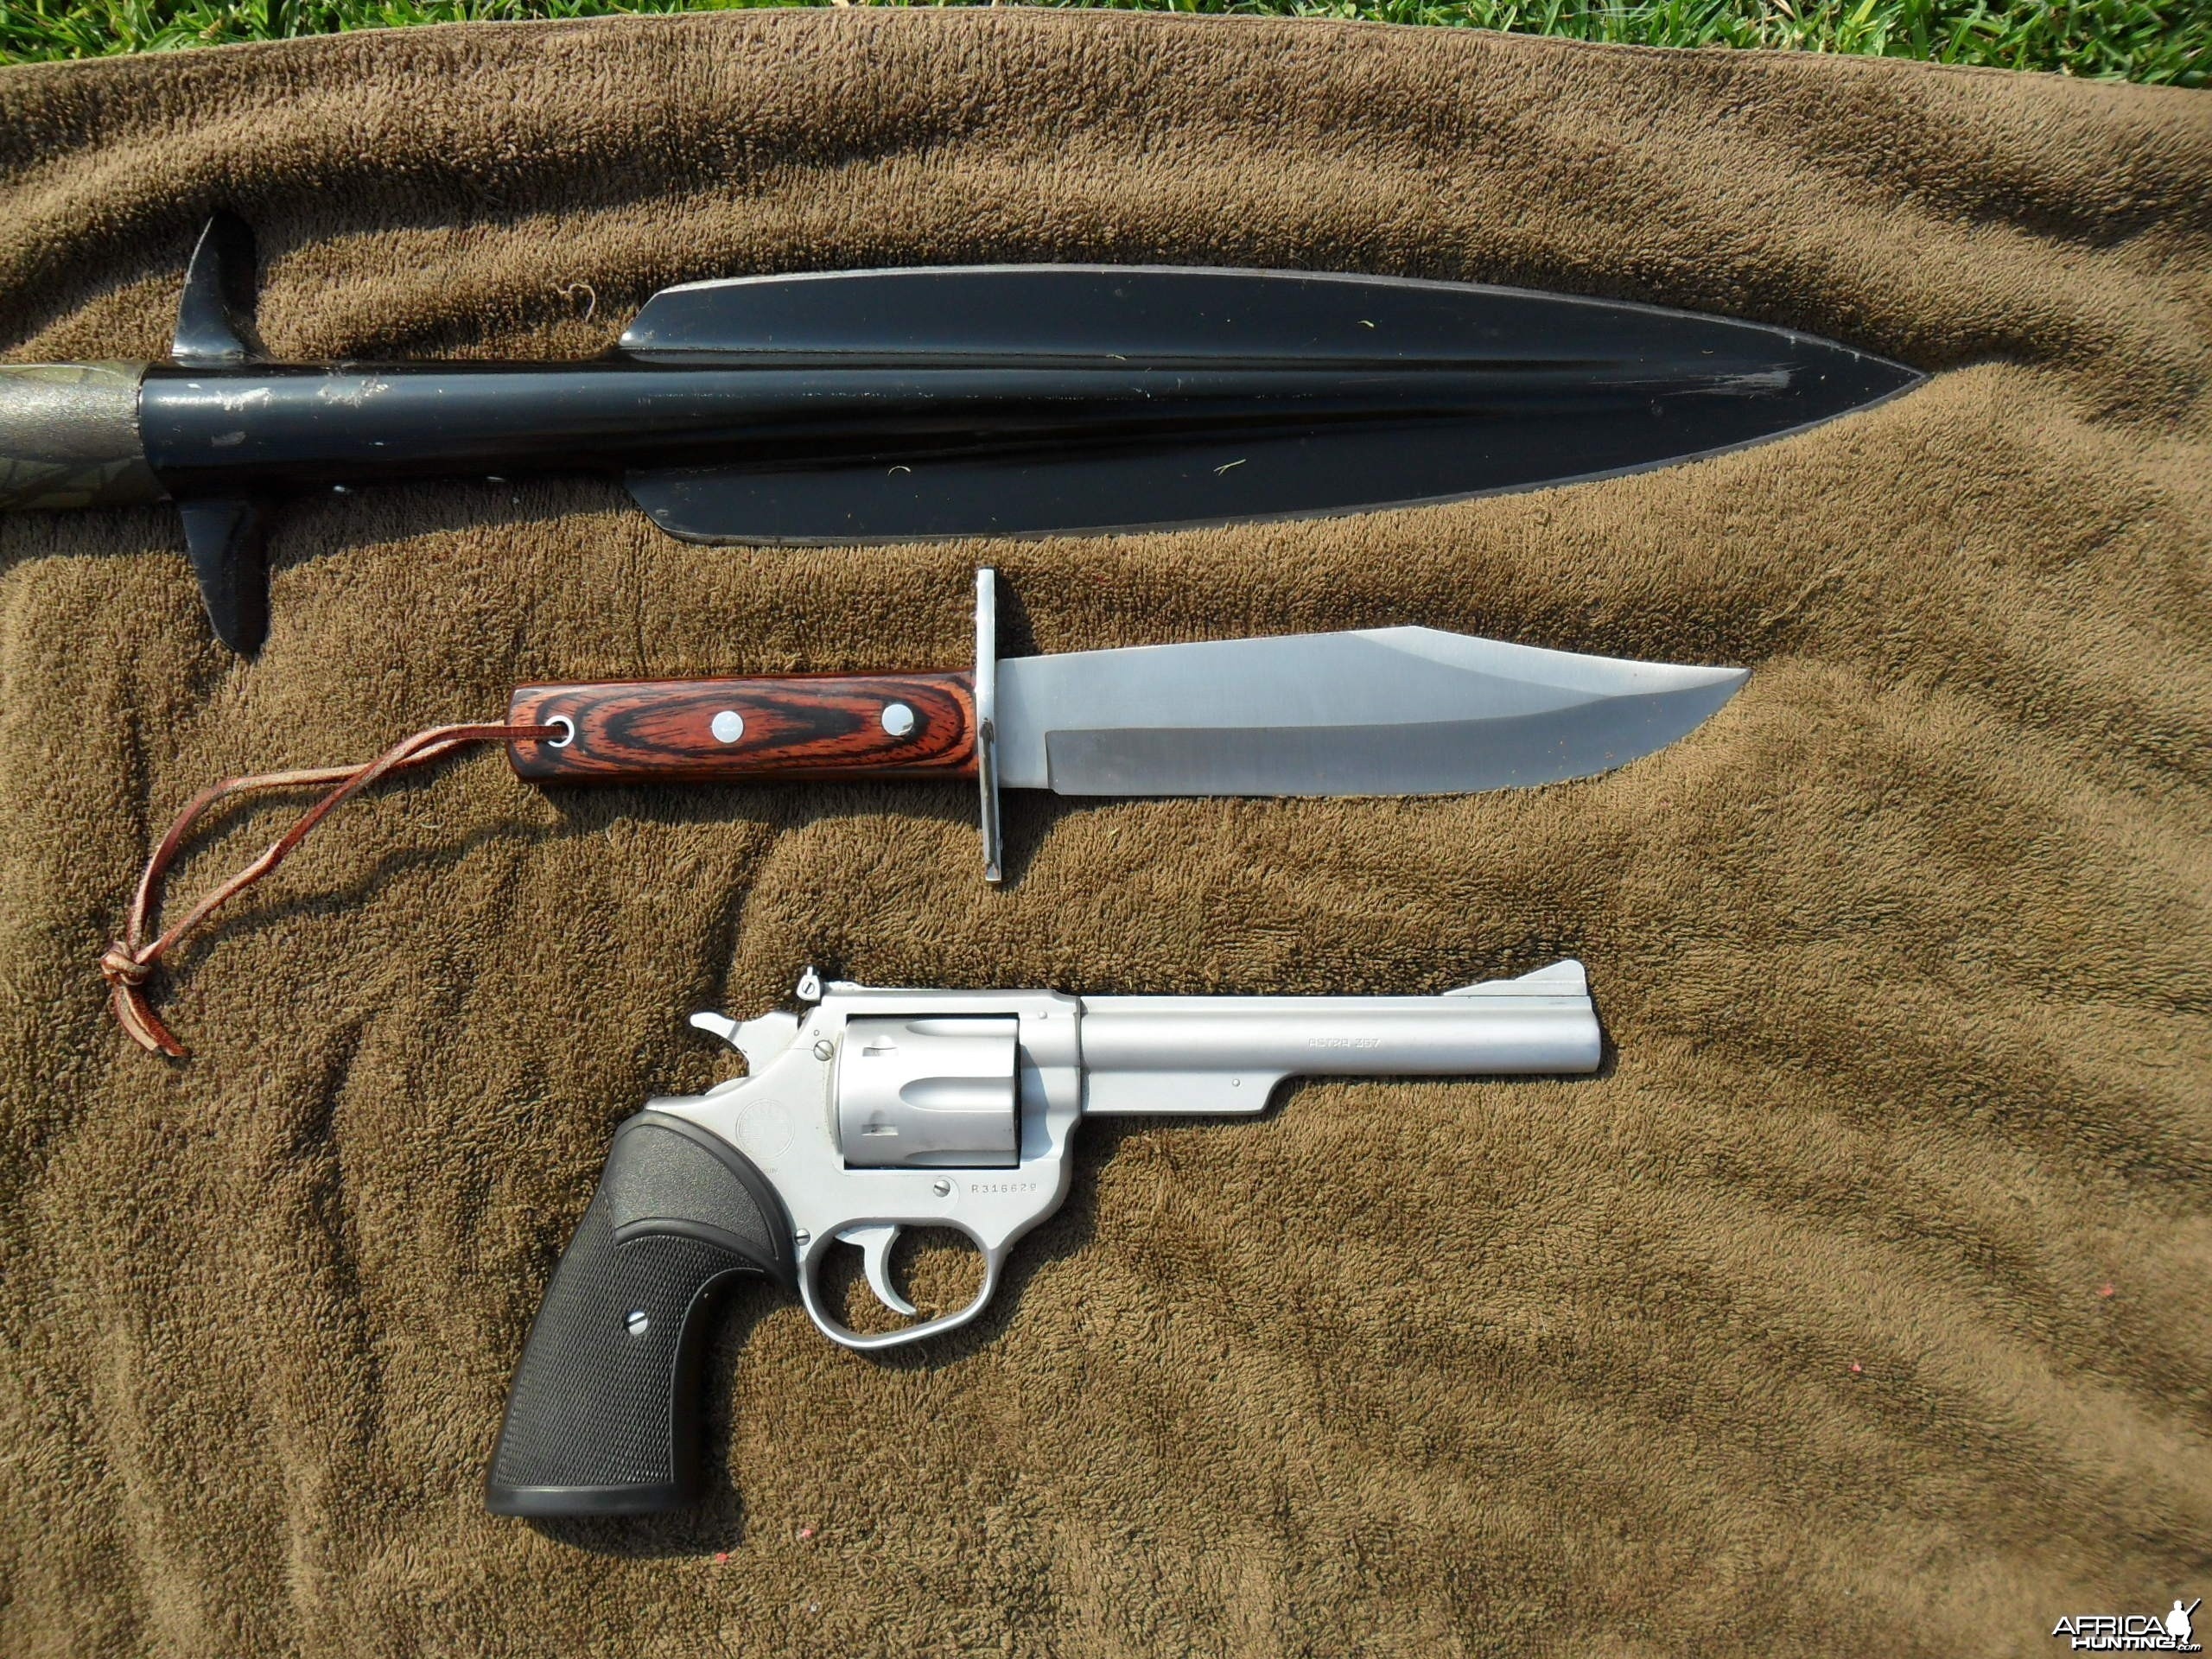 My adventurous hunting kit...